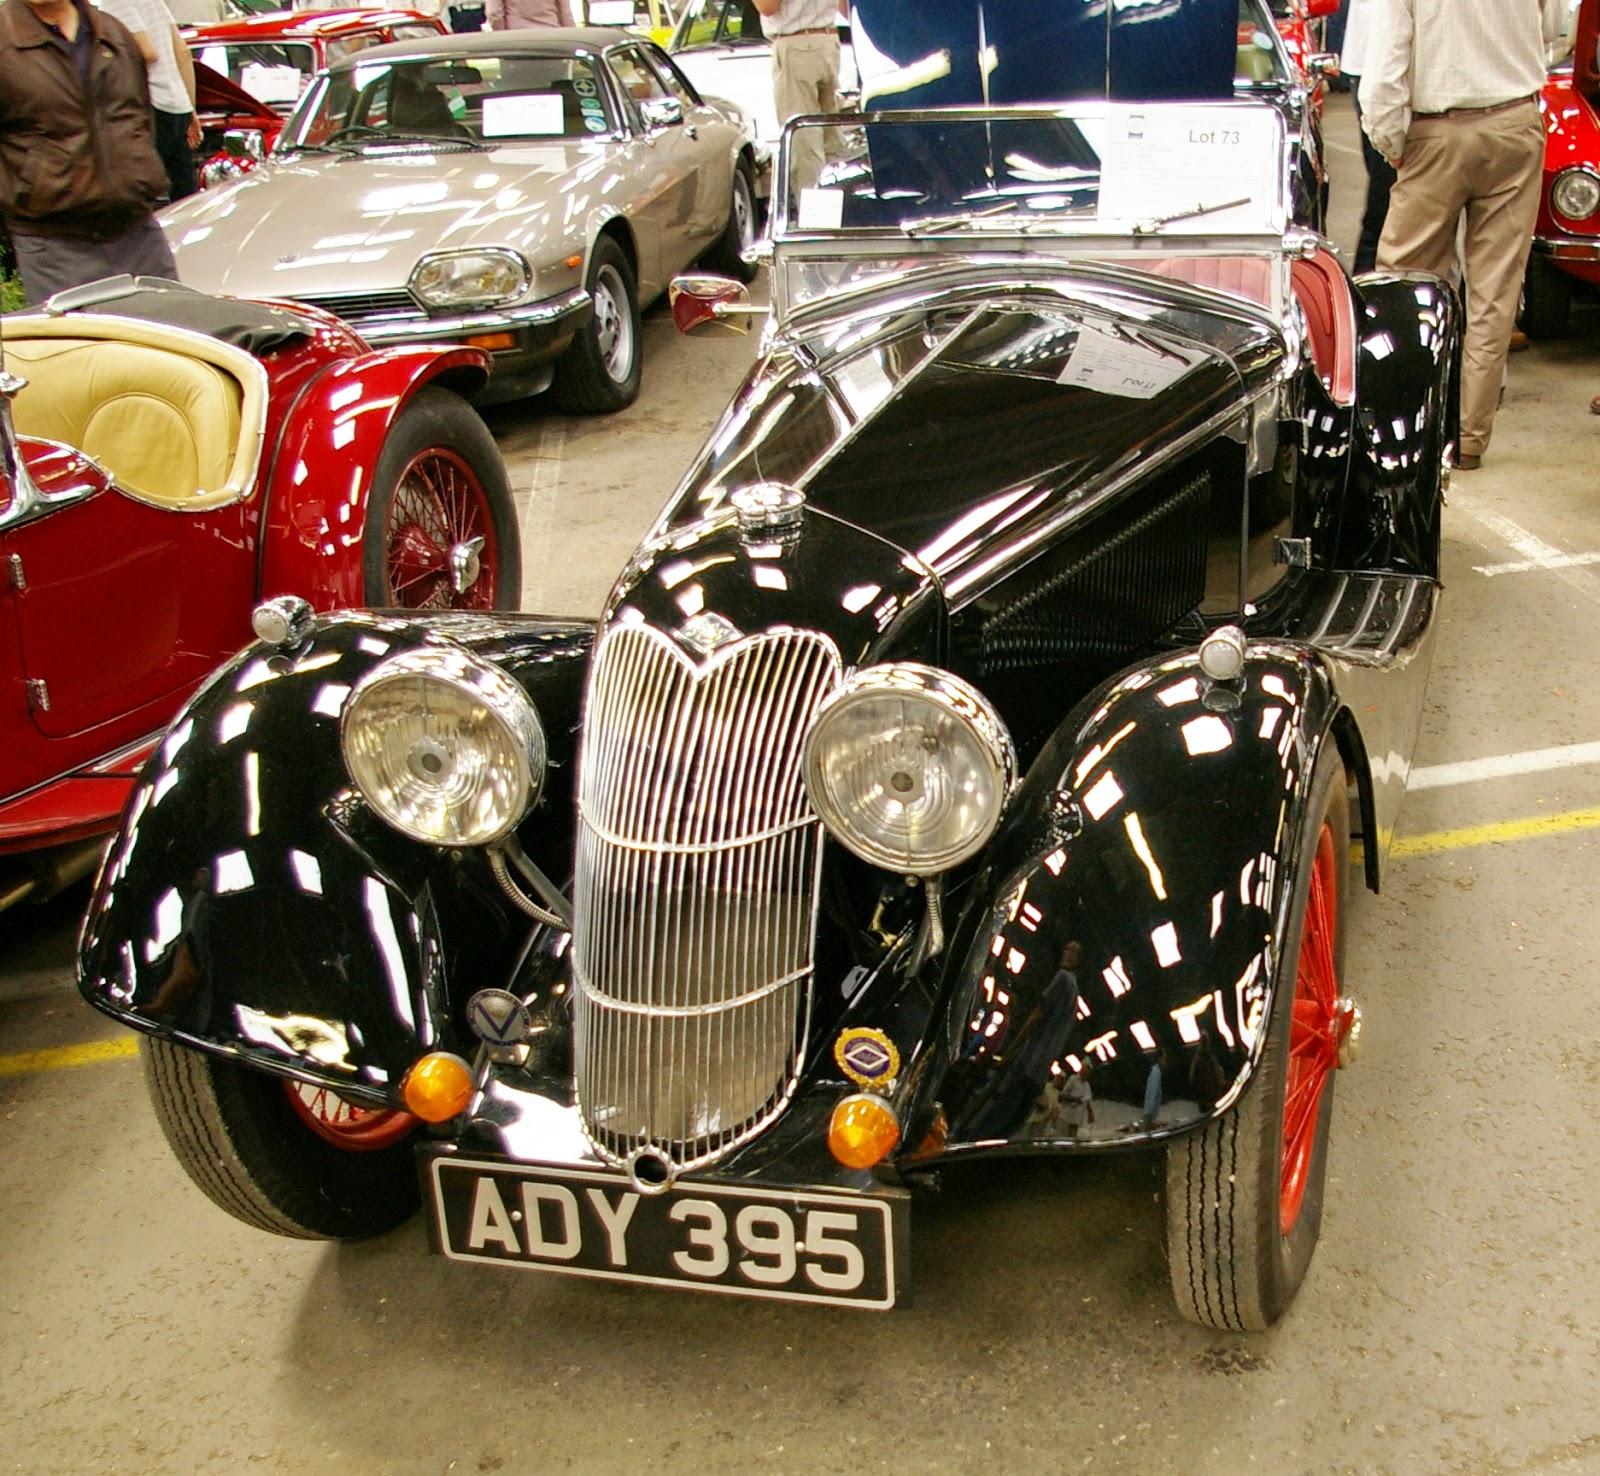 Car Auctions - Brightwells - Leominster Auction June 2009